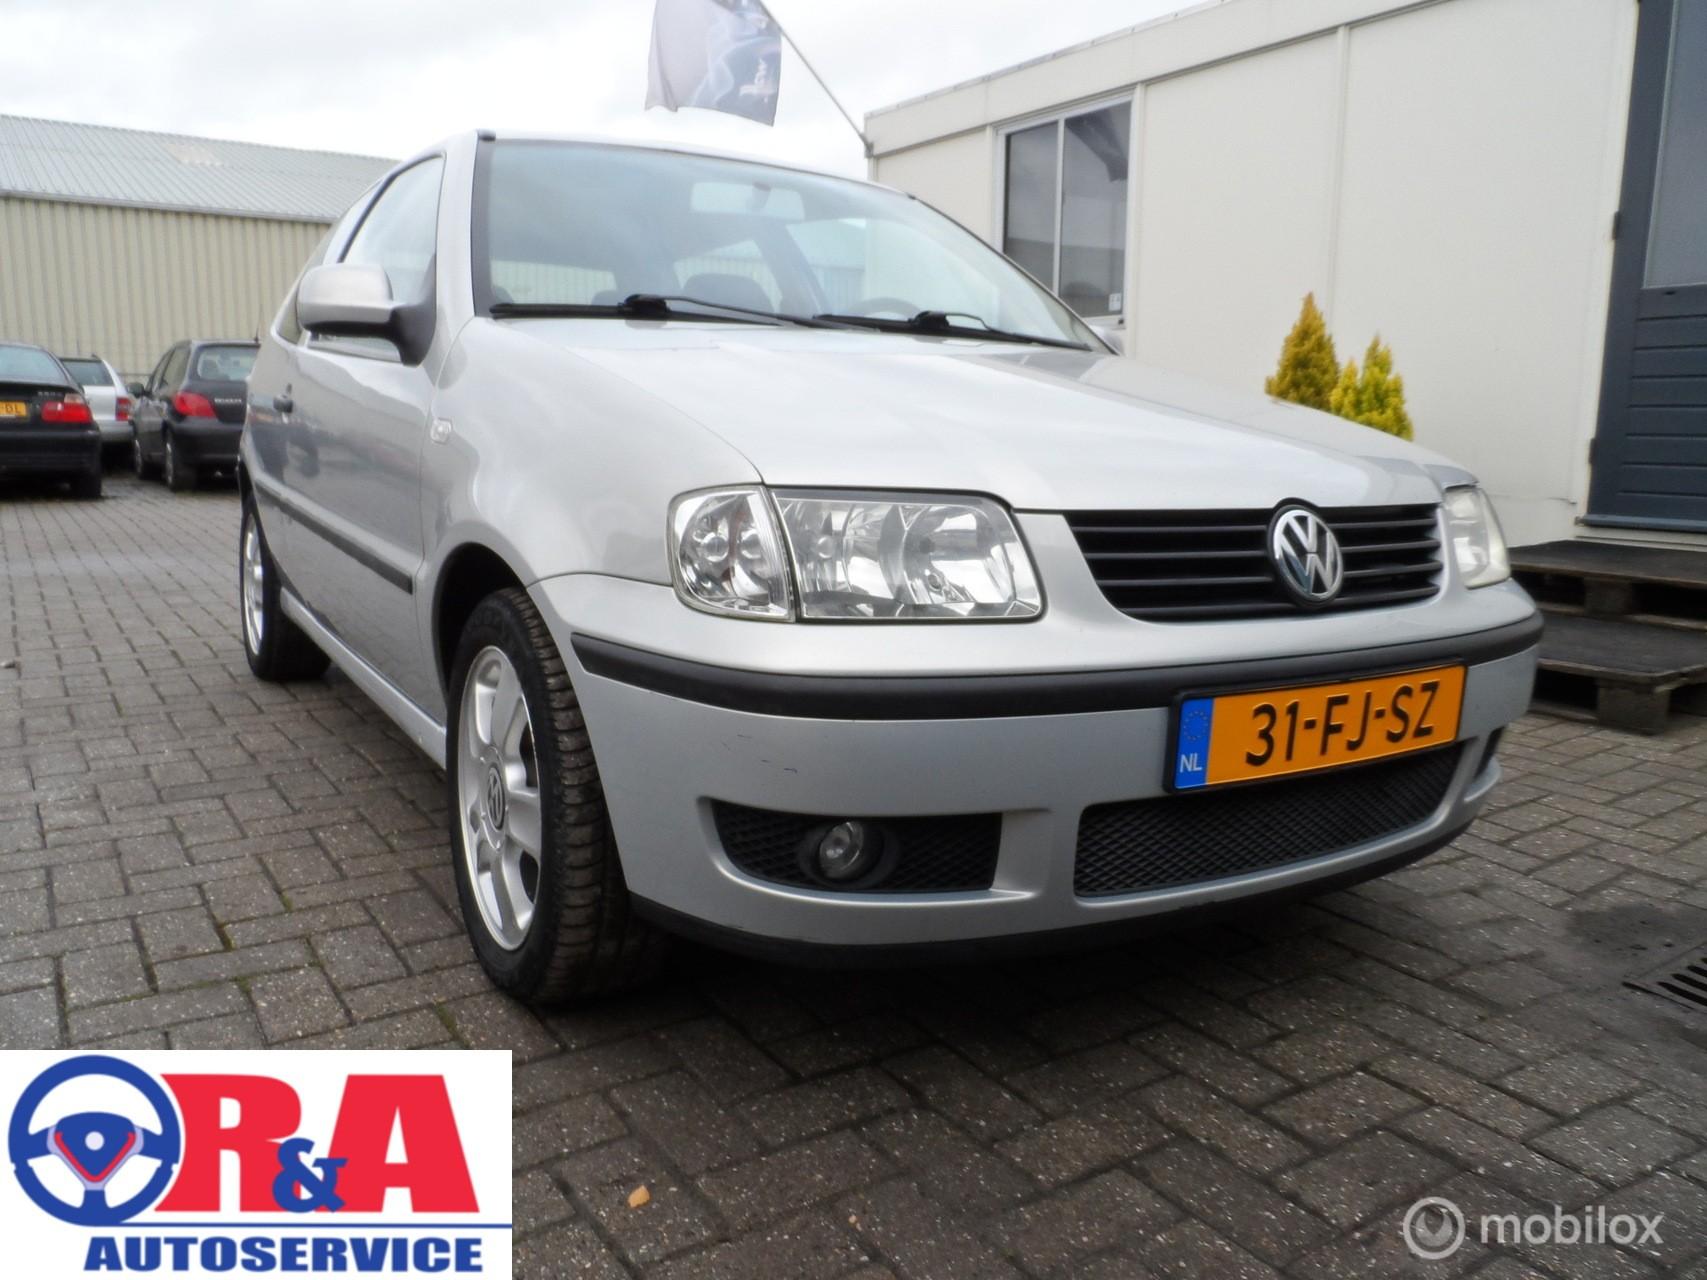 Volkswagen Polo 1.9 D | Mistlampen | Trekhaak | LM Velgen |